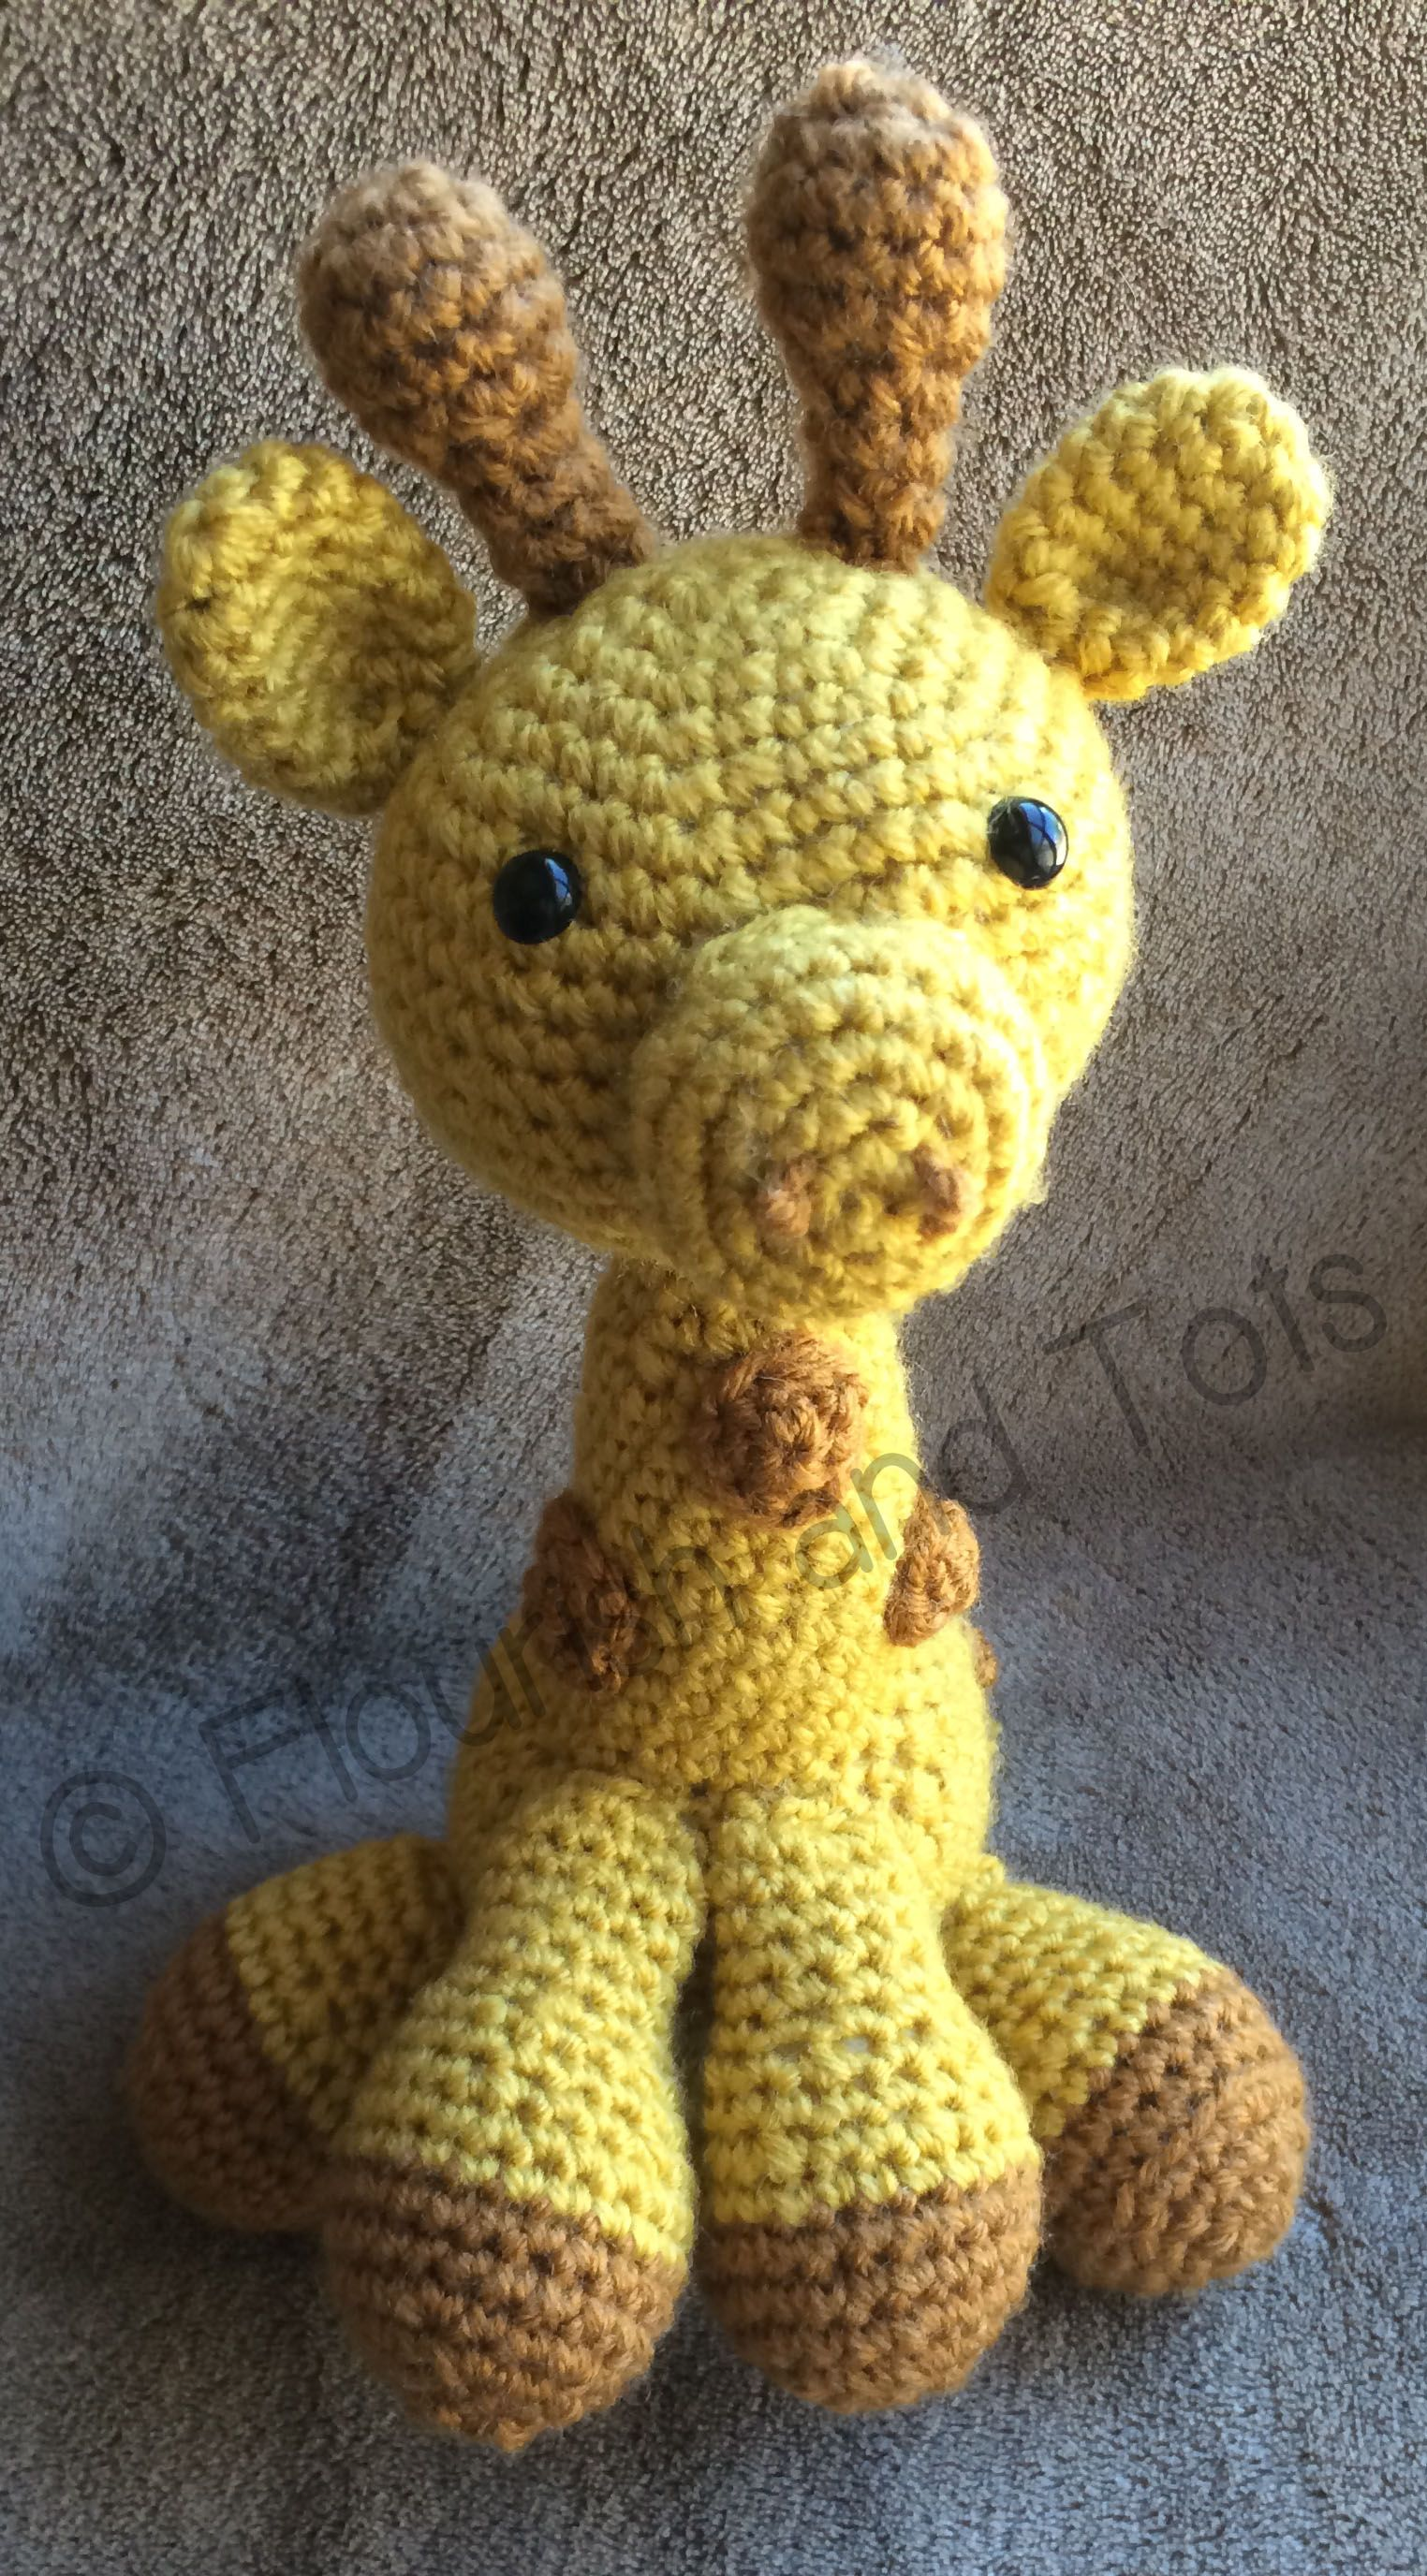 Cute Crochet Patterns Free And Pinterest Favorites | Crochet ... | 2752x1524